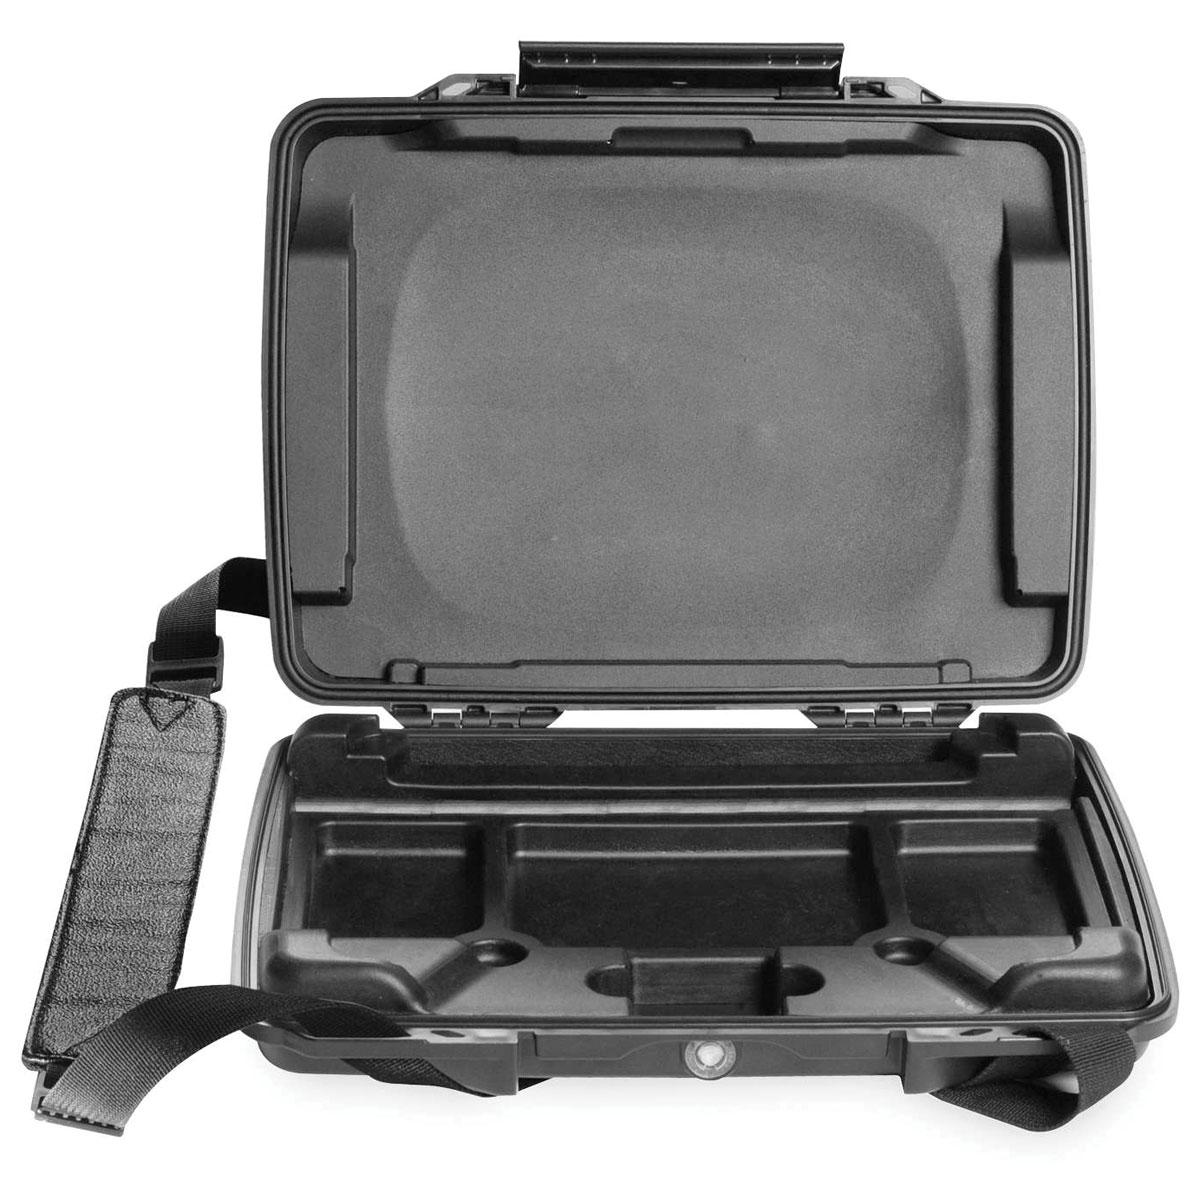 Pelican Products, Inc i1075 Hardback Case